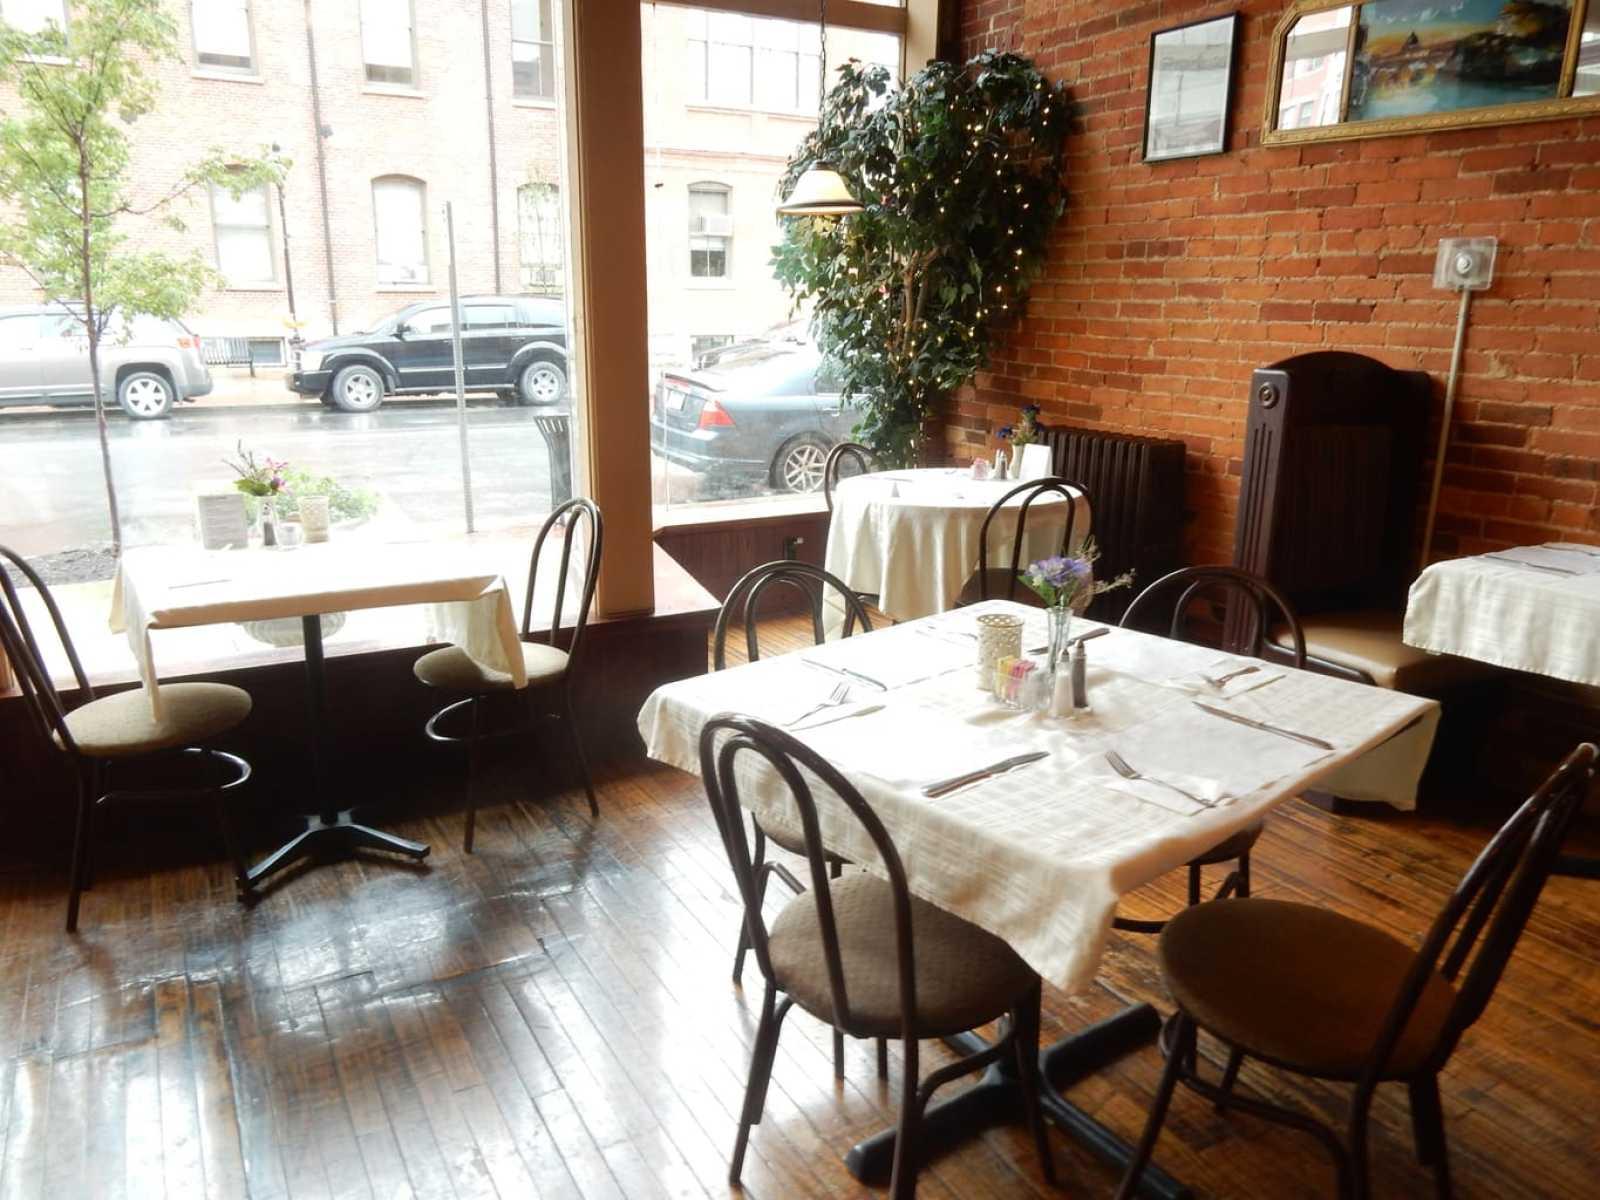 Moana's Restaurant Clearfield PA